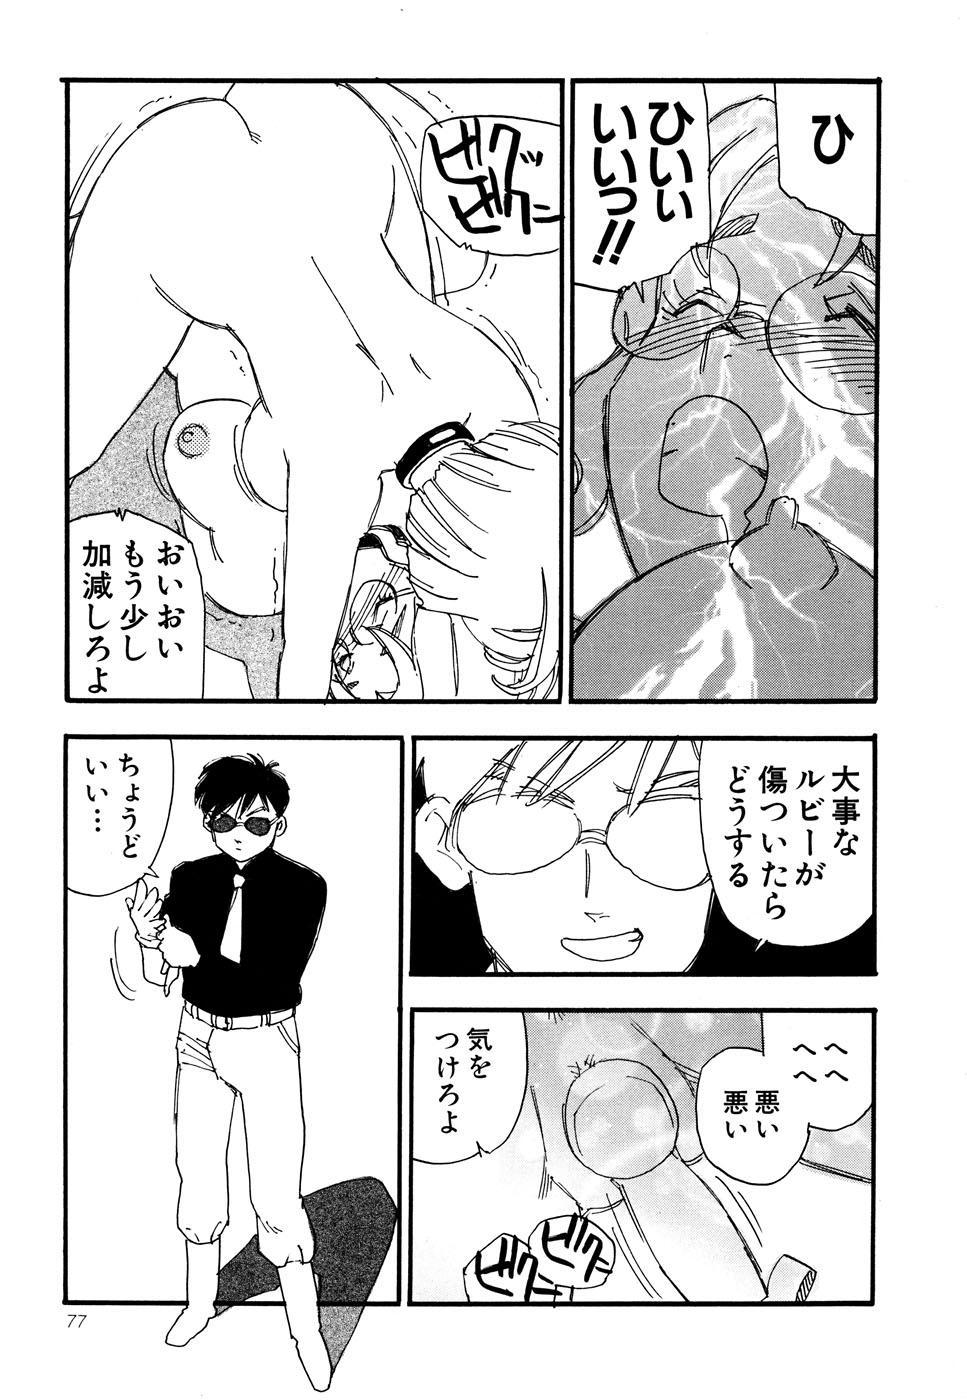 G-drive Vol.1 Ryoujokuhen 76